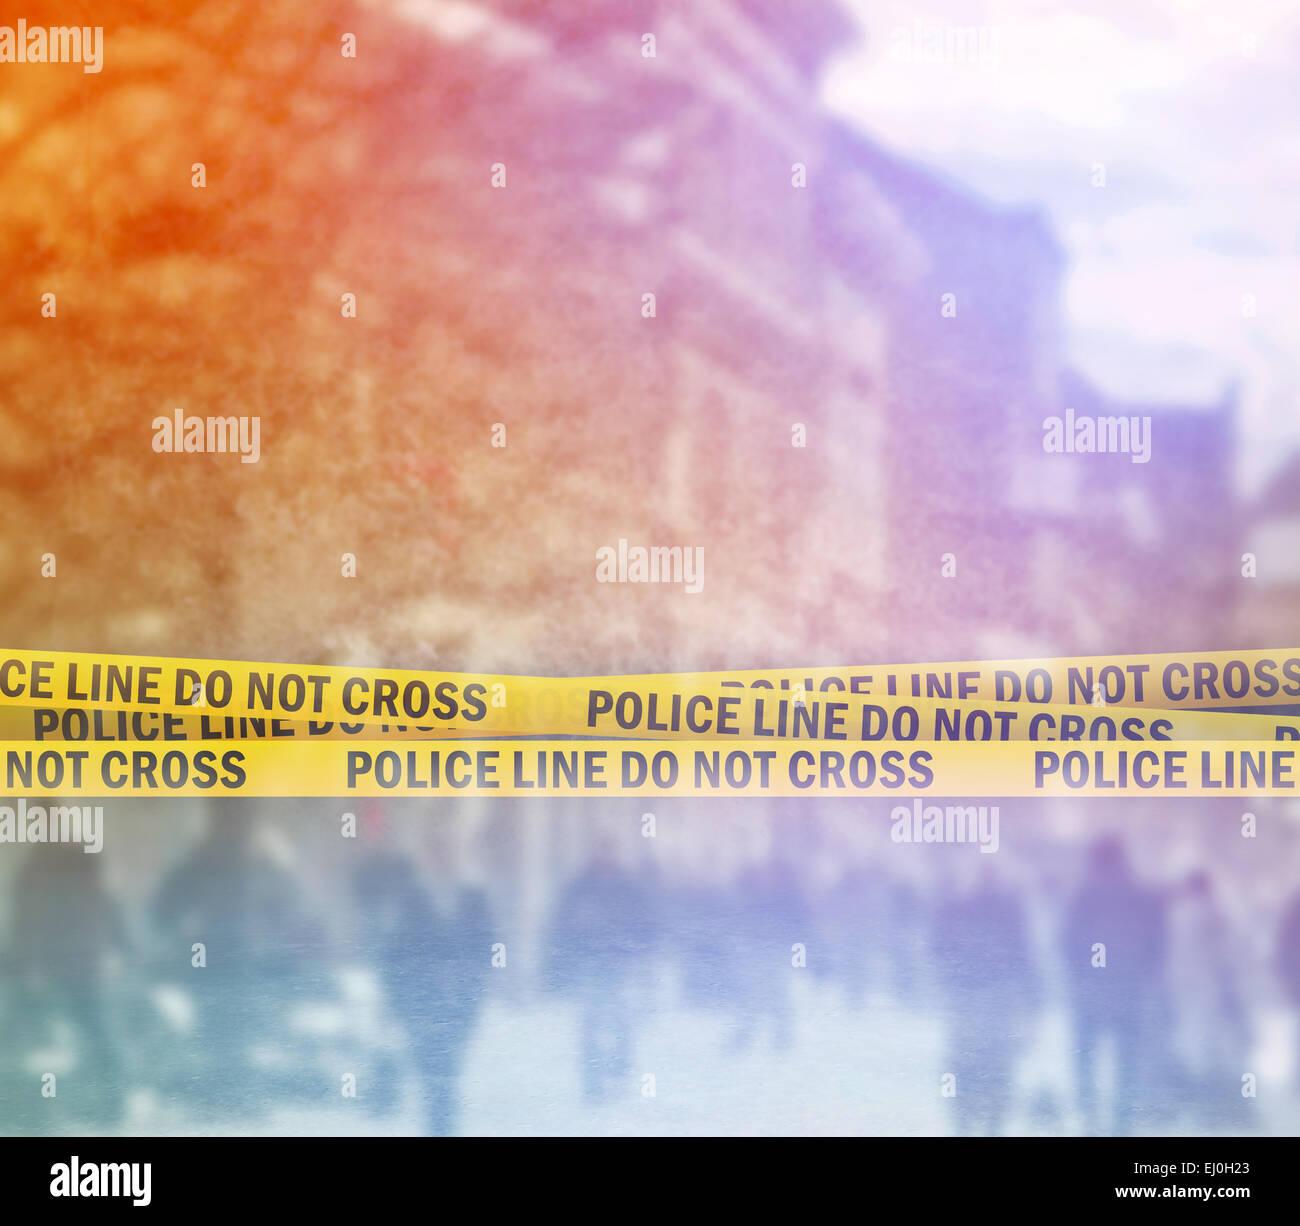 Police Line Do Not Cross Yellow Headband Tape, Crime Scene on the Street - Stock Image